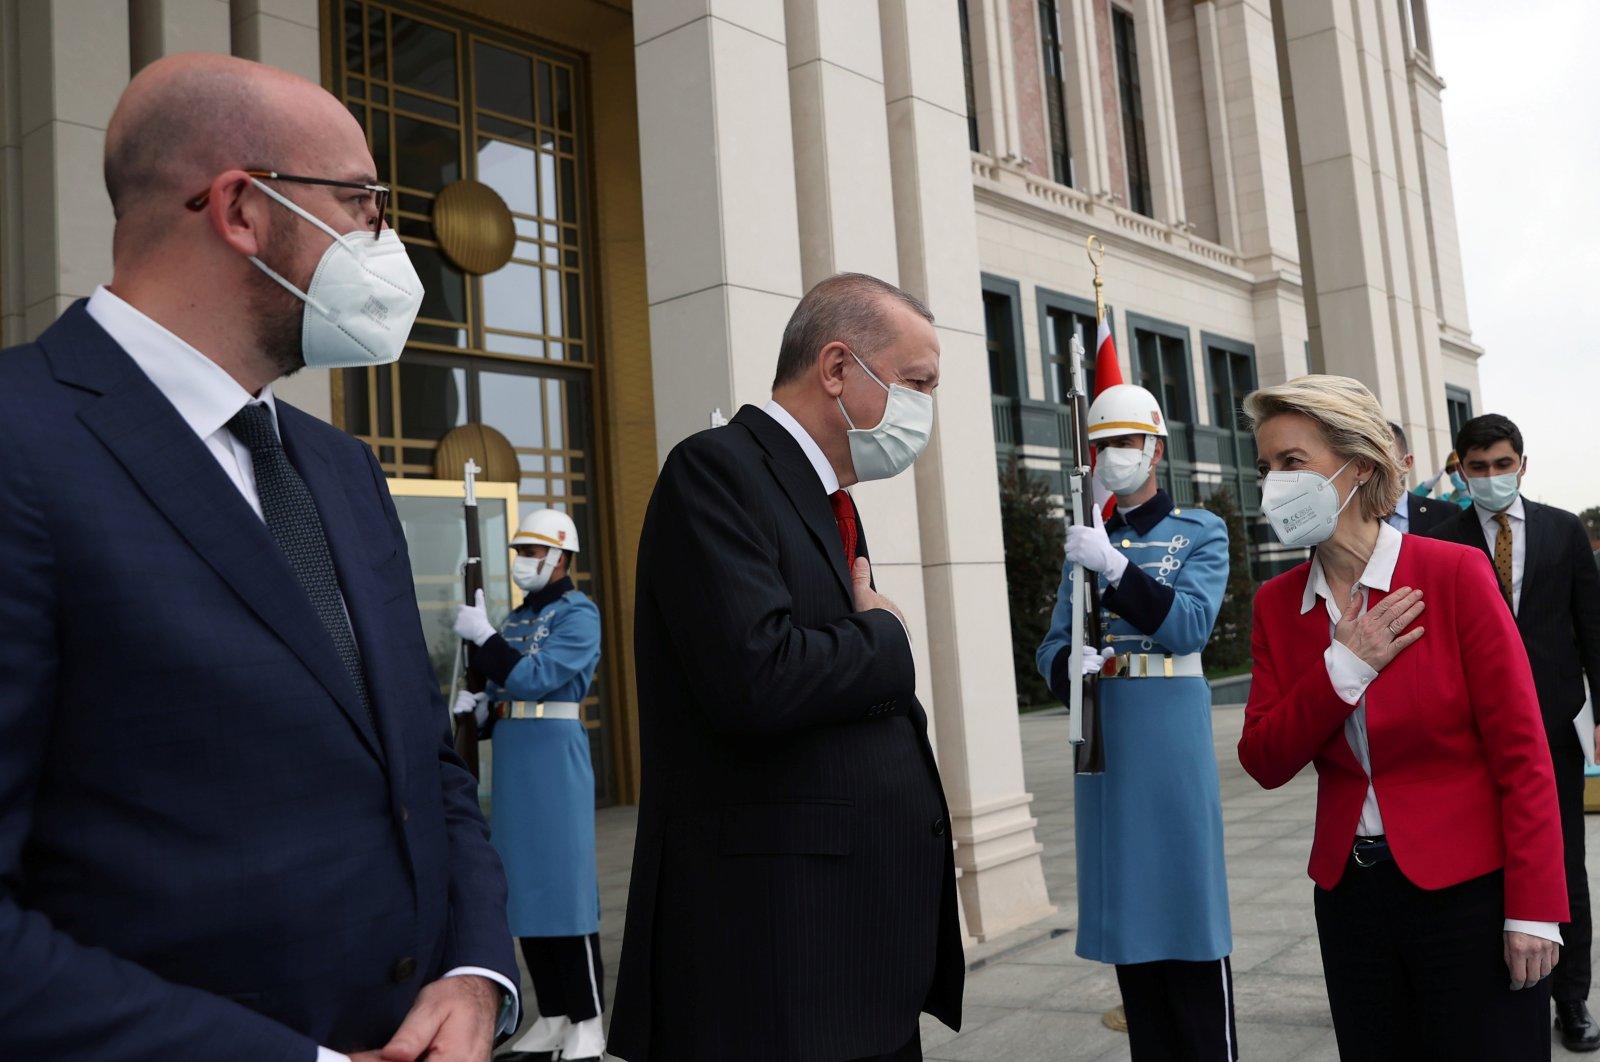 President Recep Tayyip Erdoğan (C) meets with European Council President Charles Michel (L) and European Commission President Ursula von der Leyen, in Ankara, Turkey, April 6, 2021. (Reuters Photo)